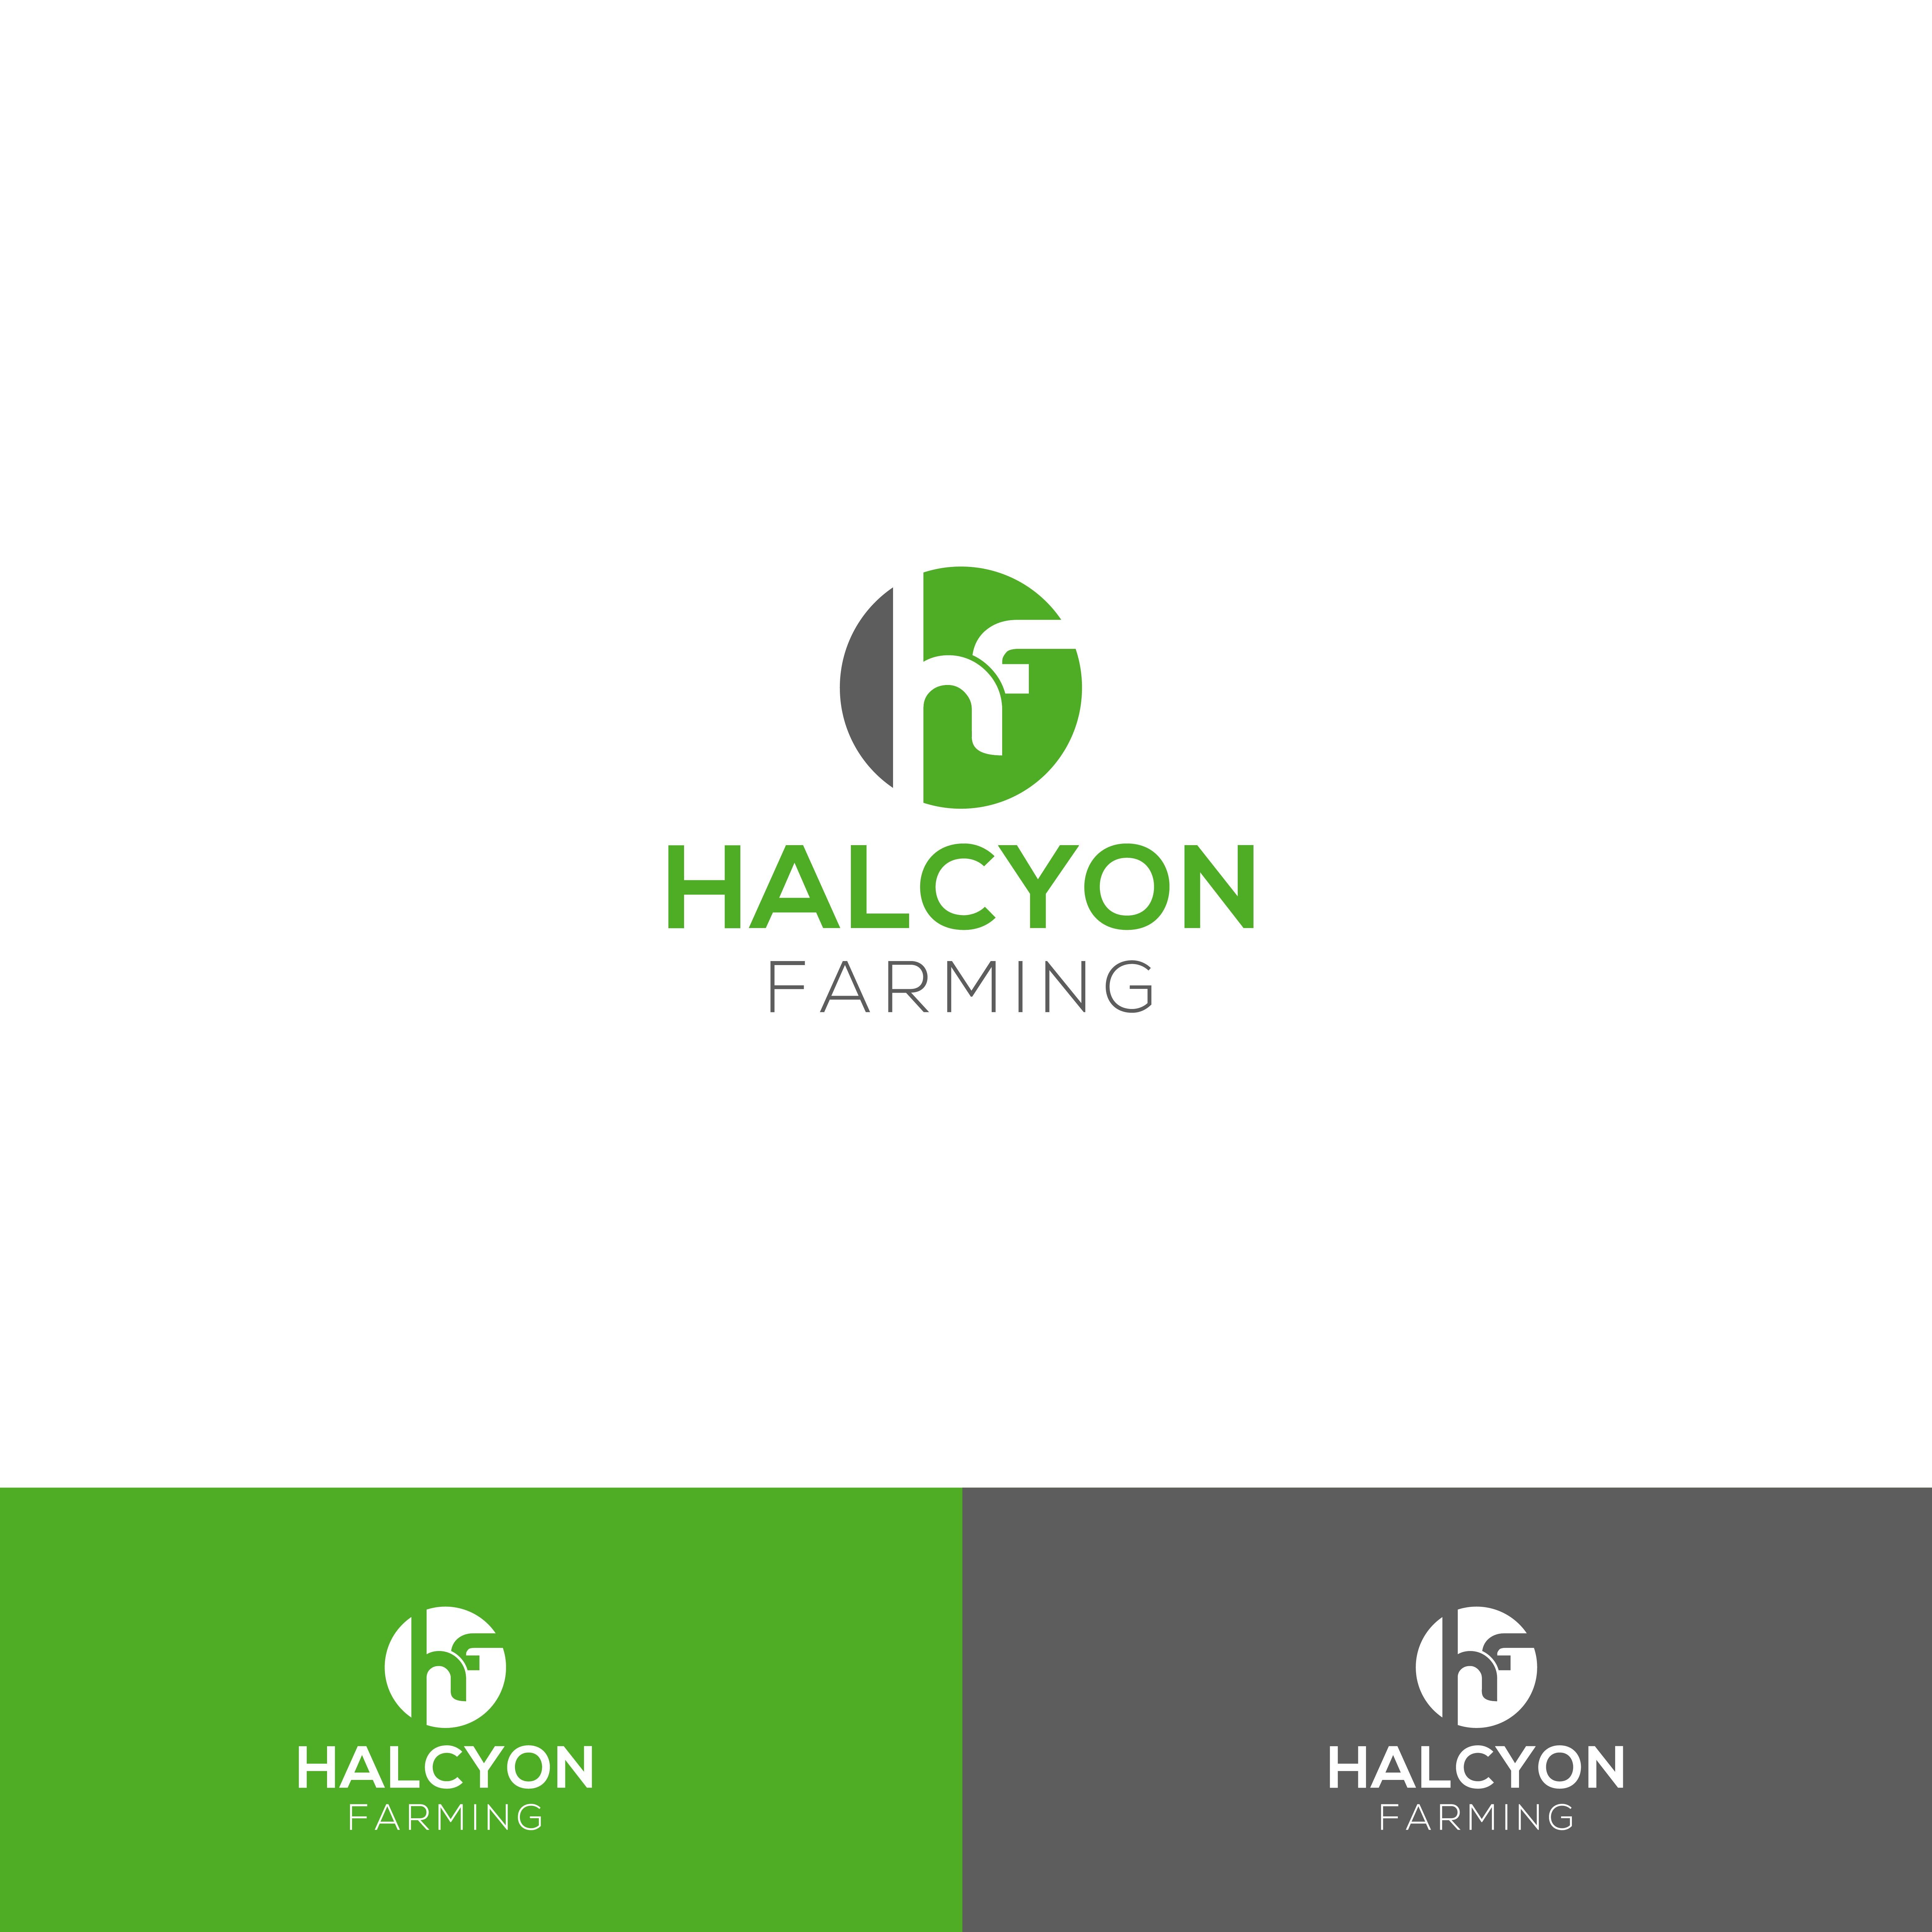 Logo Design by Al Alif - Entry No. 63 in the Logo Design Contest Creative Logo Design for Halcyon Farming.